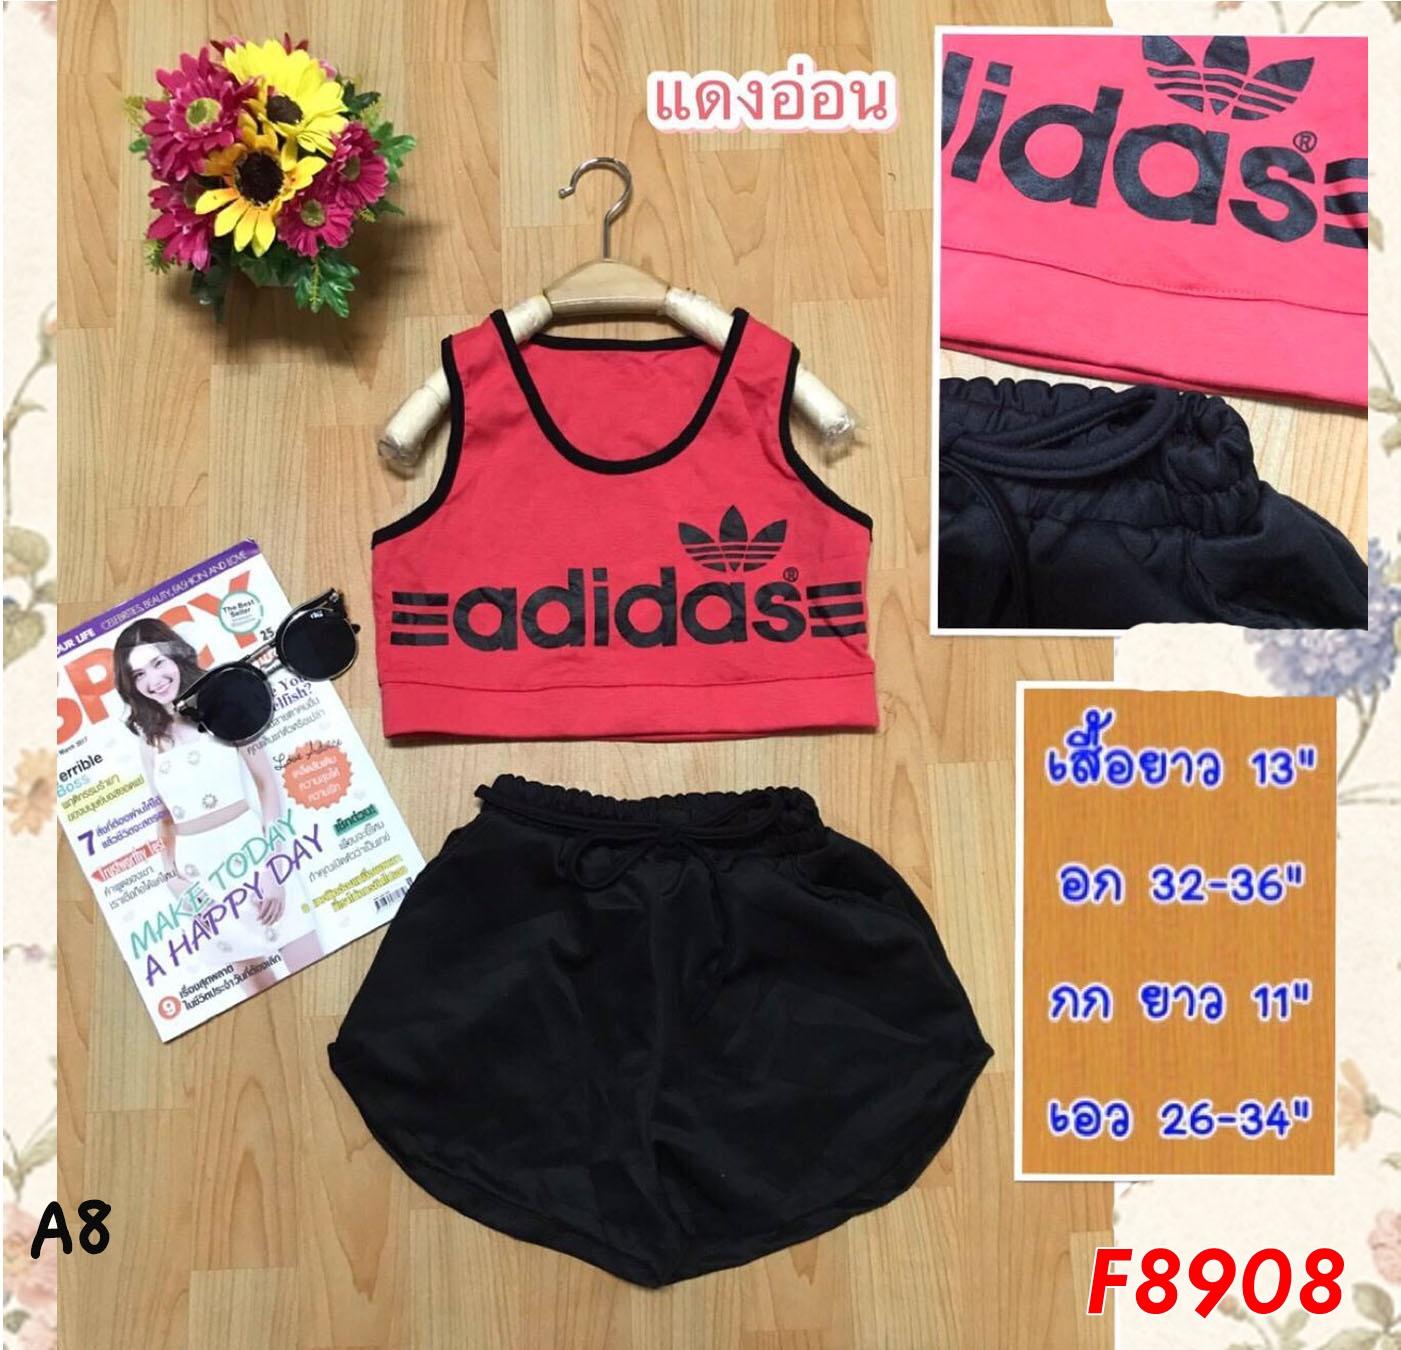 F8908 ชุดเล่นน้ำสีแดงอ่อน adidas + กางเกงขาสั้นสีดำ